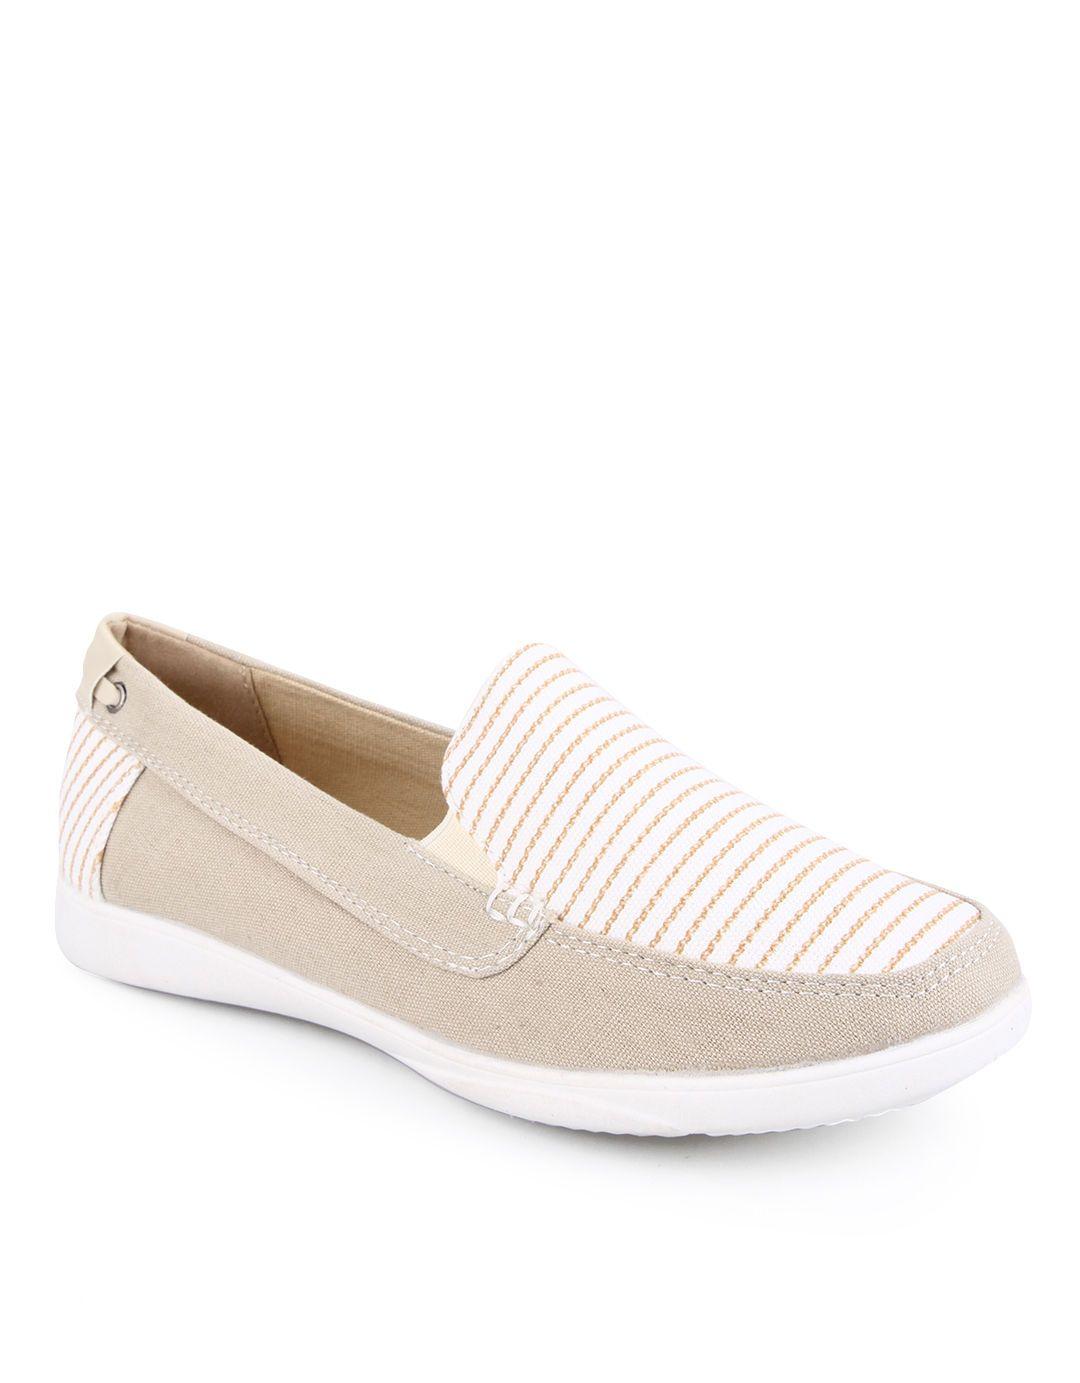 Nevada Easy Stripes Slip On Shoes Beige Sepatu Sepatu Adidas